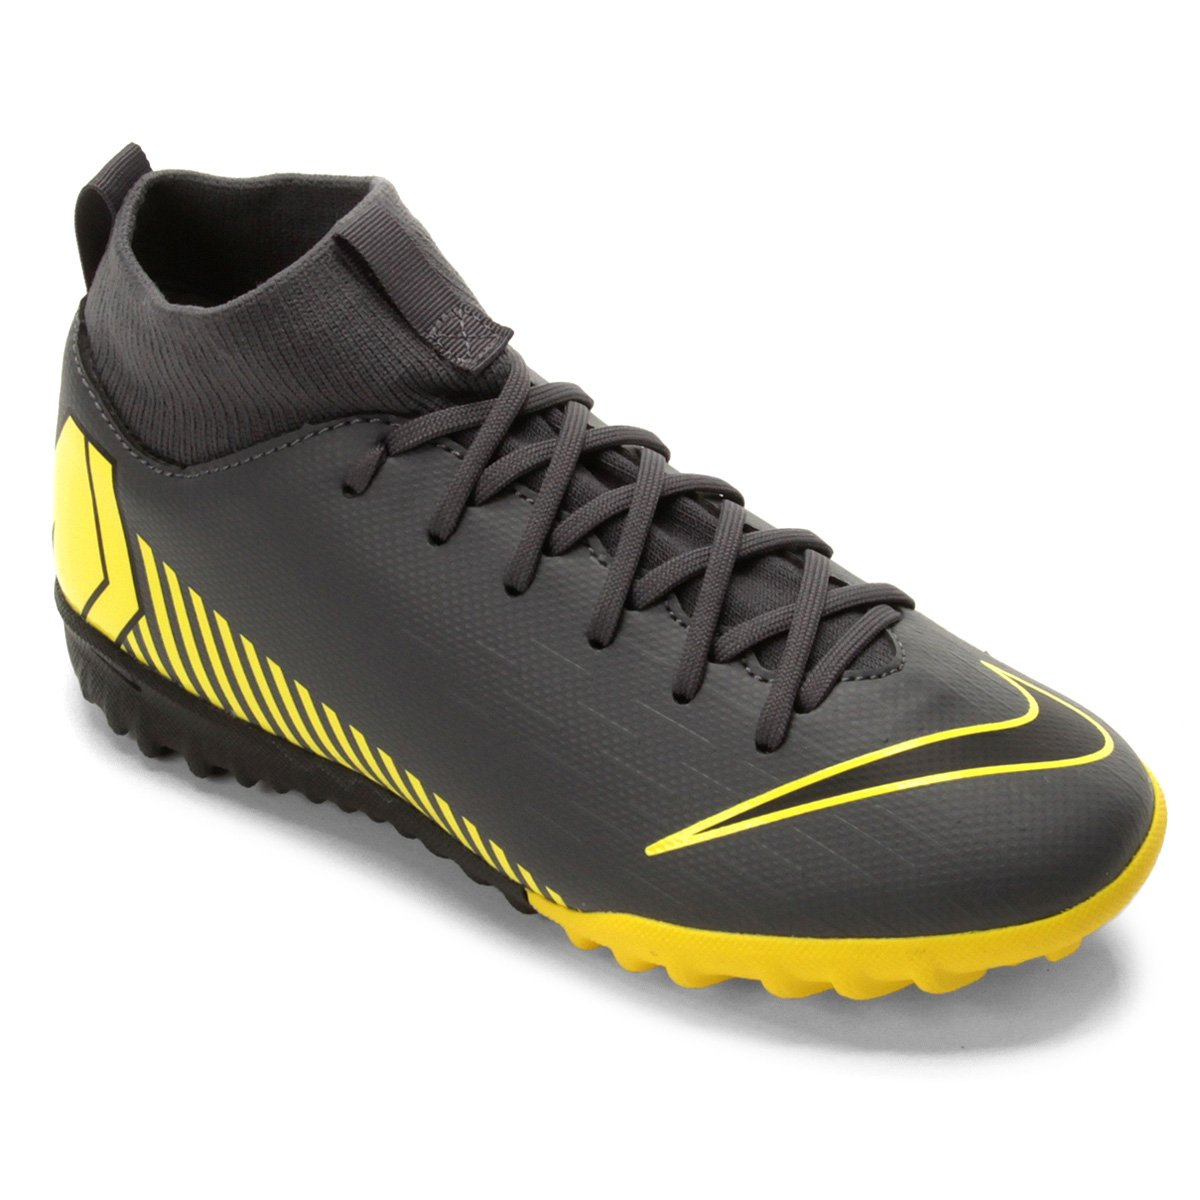 603a1c94f9c Chuteira Society Infantil Nike Mercurial Superfly 6 Academy Gs TF - Compre  Agora